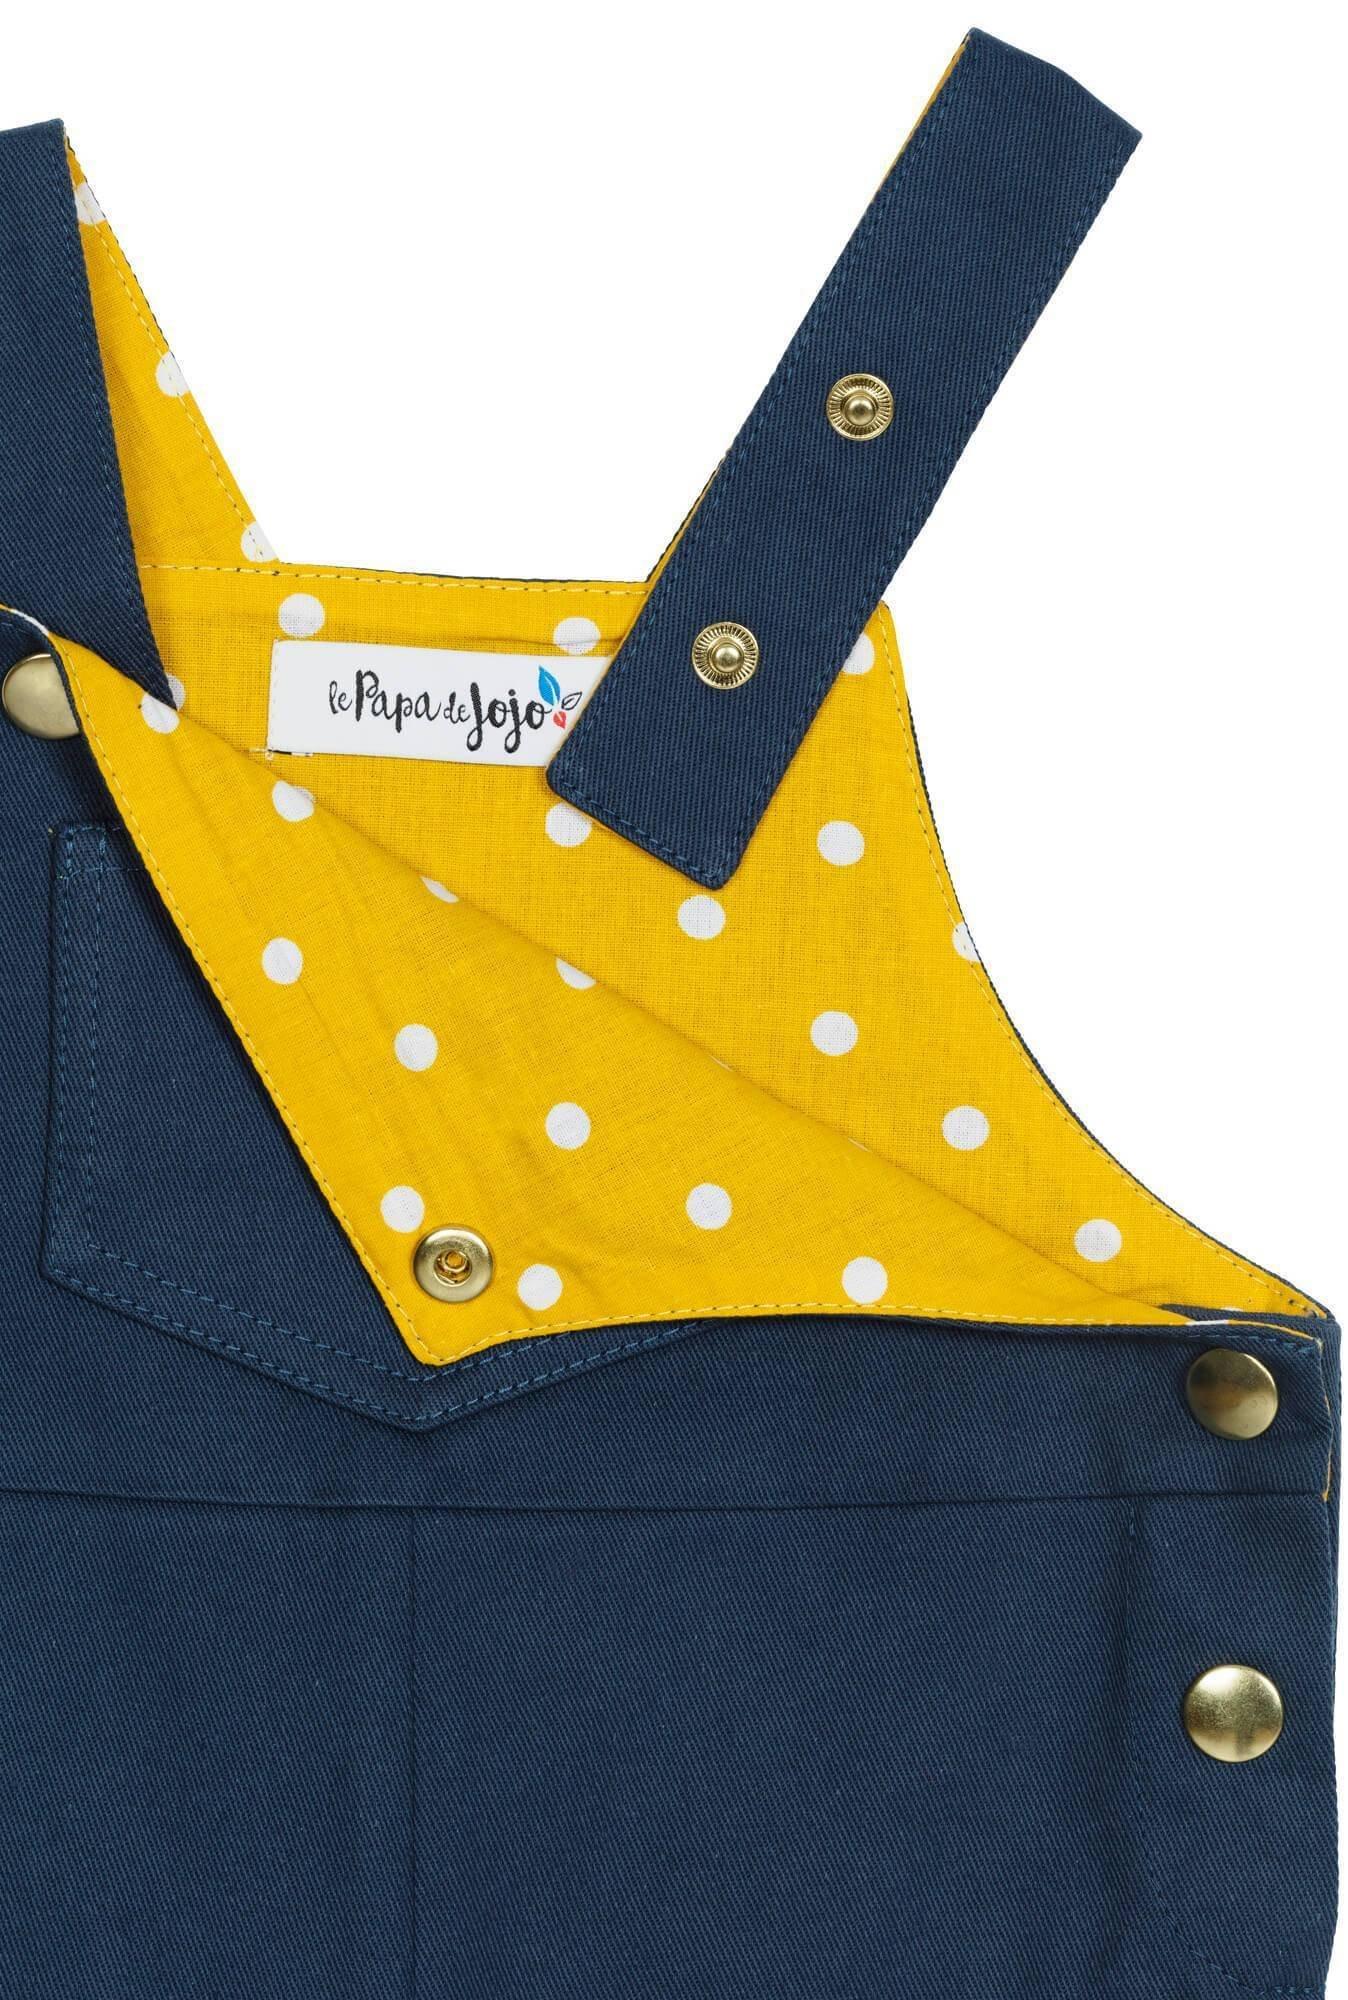 Superlipopette bleue/jaune